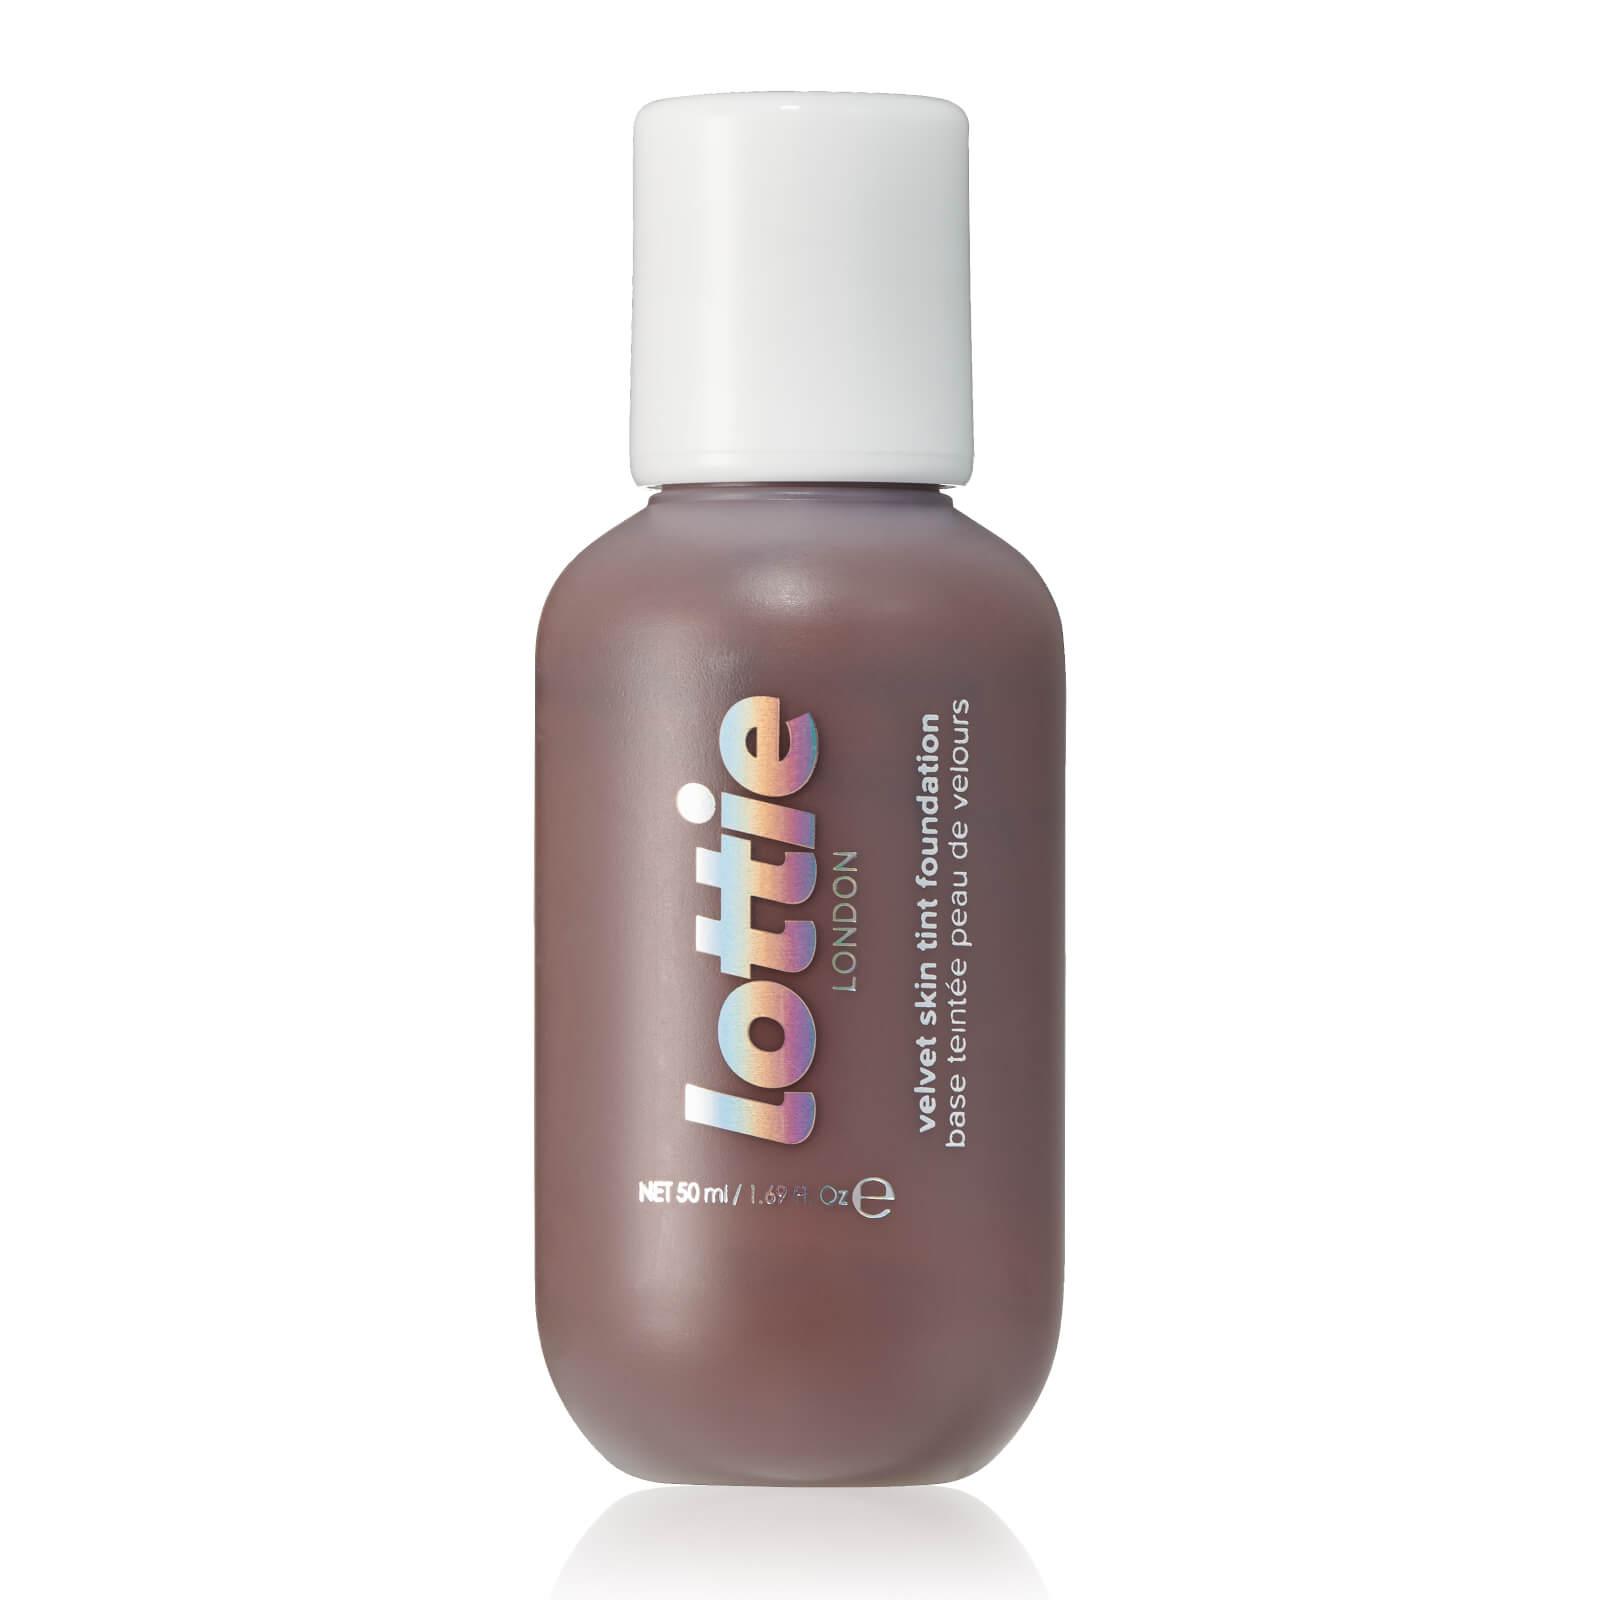 Купить Lottie London Velvet Skin Tint (Various Shades) - Deep N045